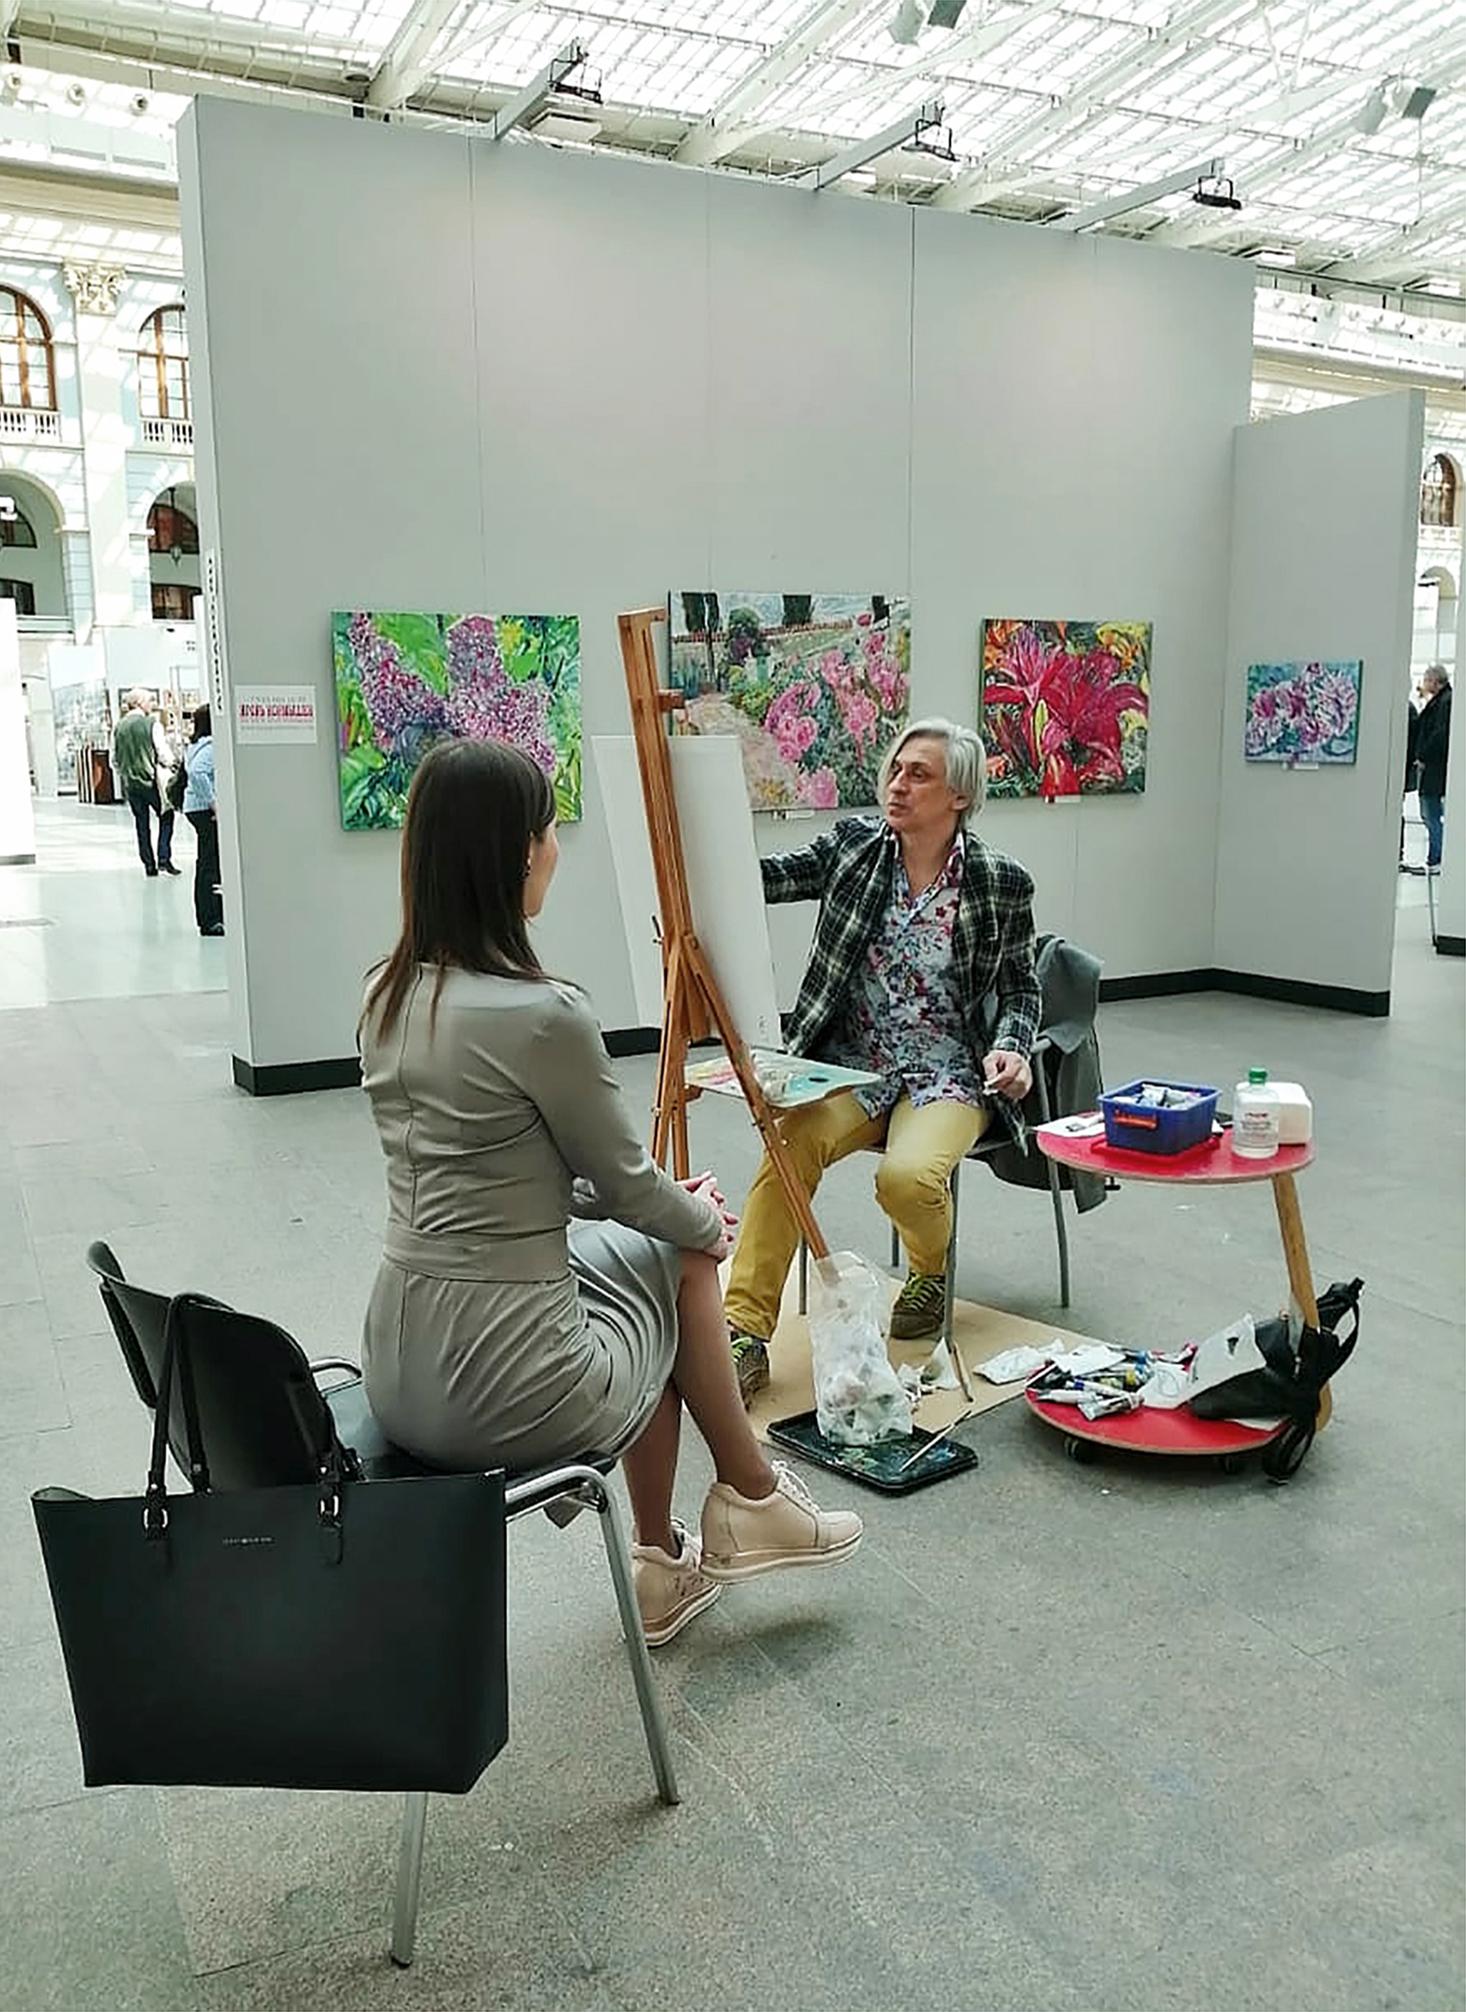 A portrait in process. At the Art April Fair. Gostiny Dvor, April 2019